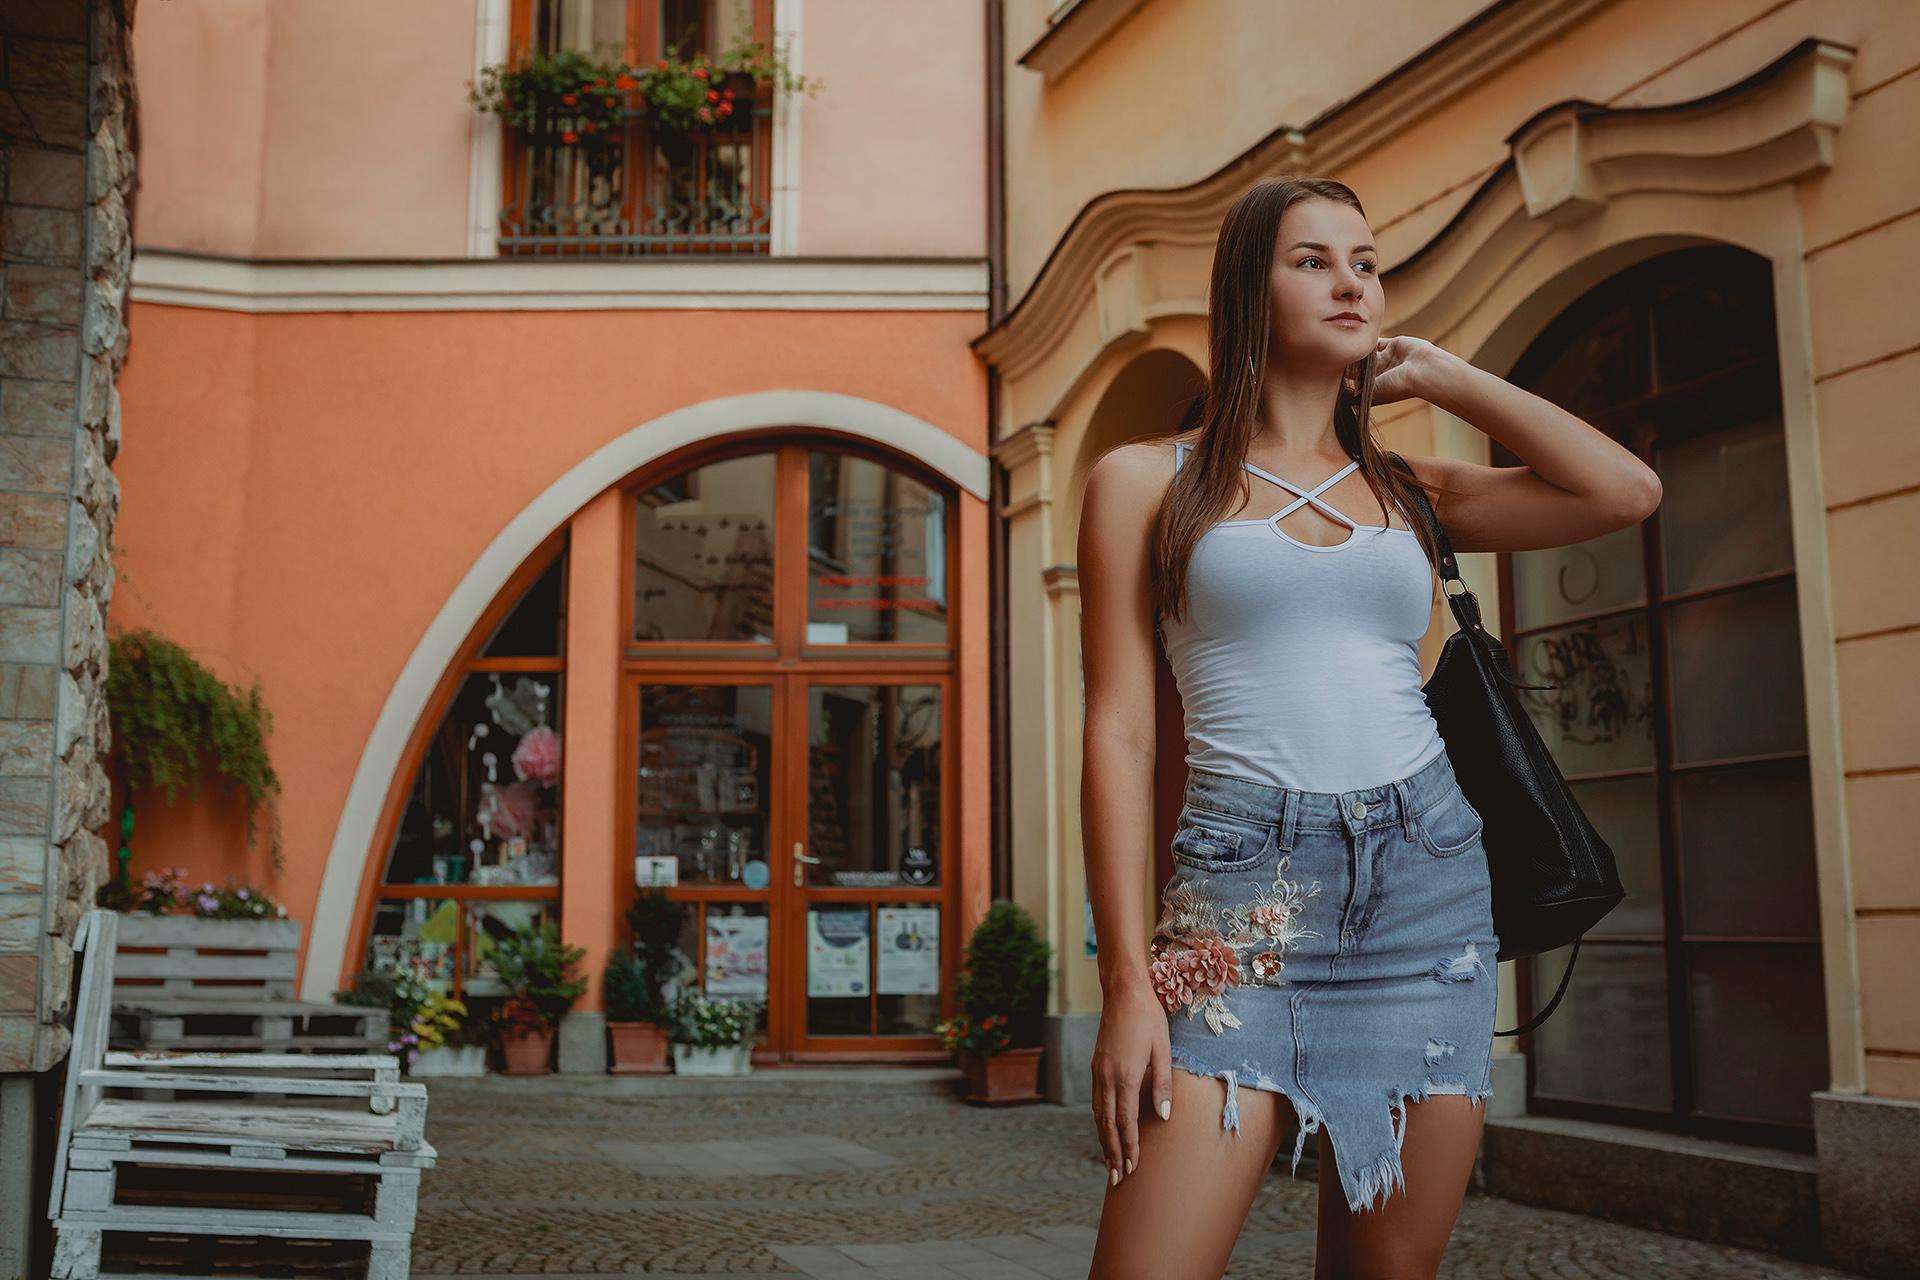 Ahoj/Szia cover girl Silvia - Kristian Marko photography